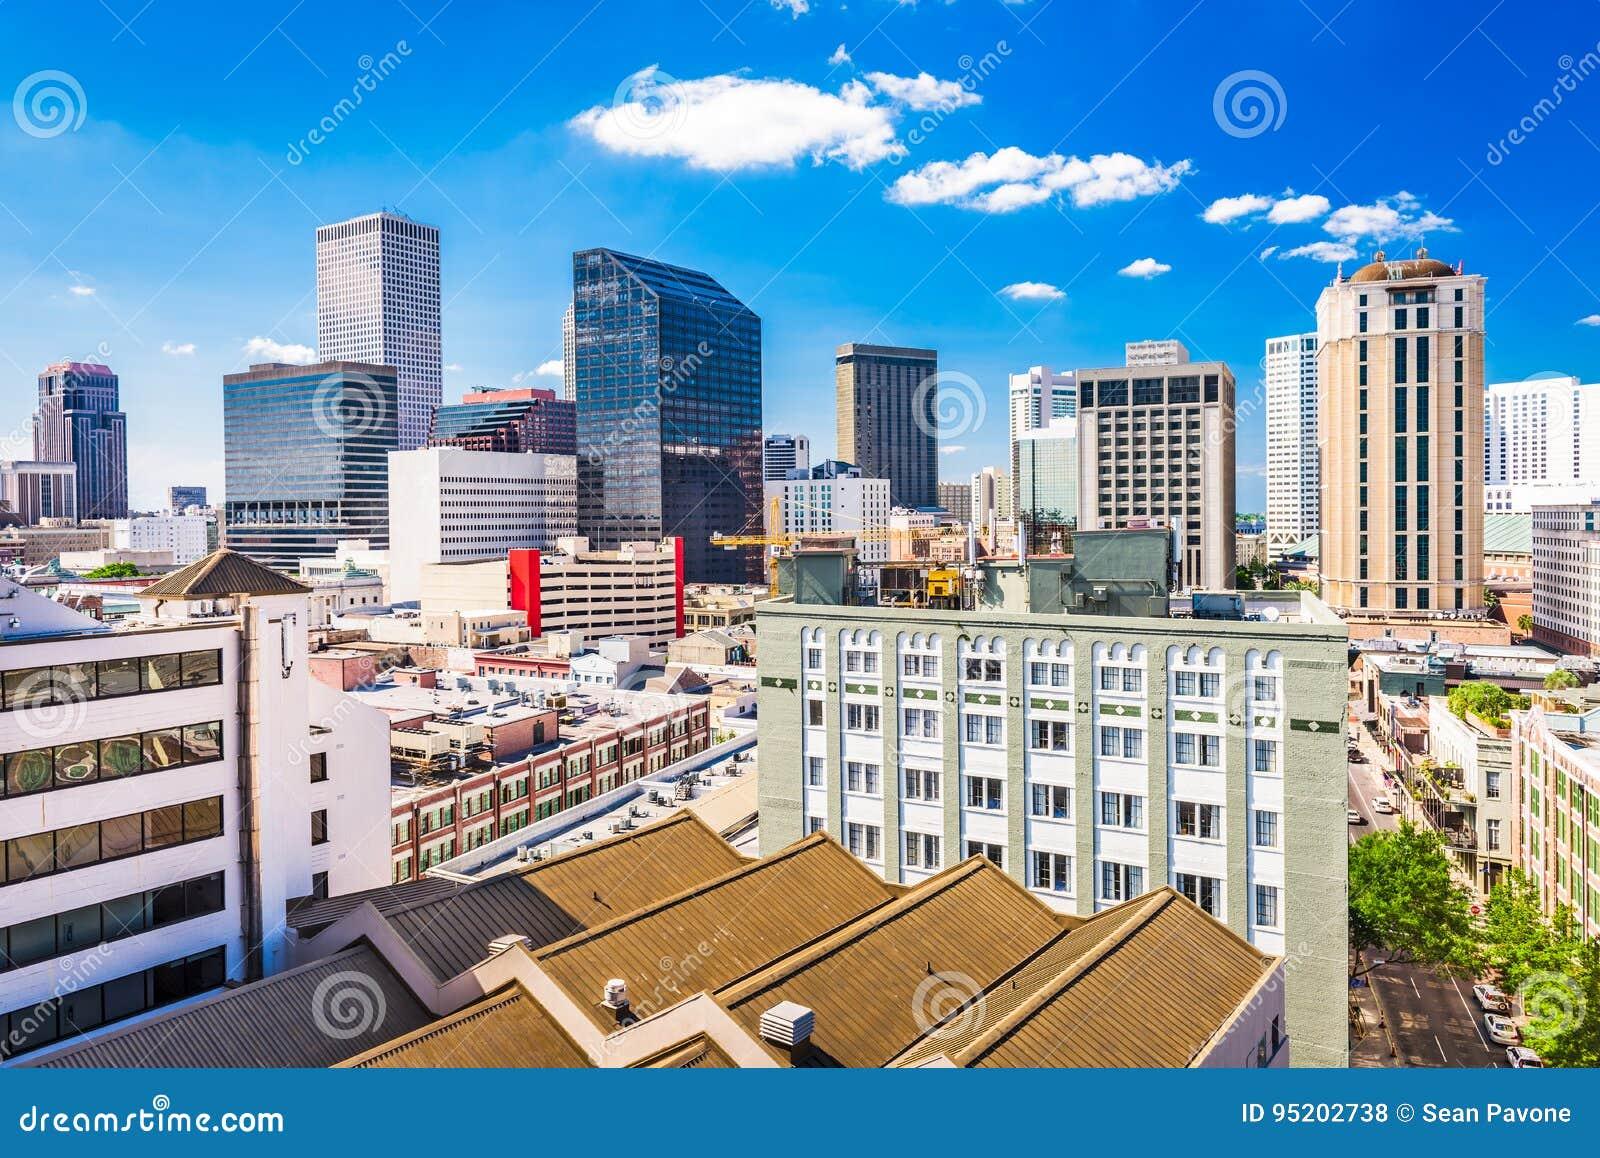 New Orleans, Lousiana, USA Skyline.